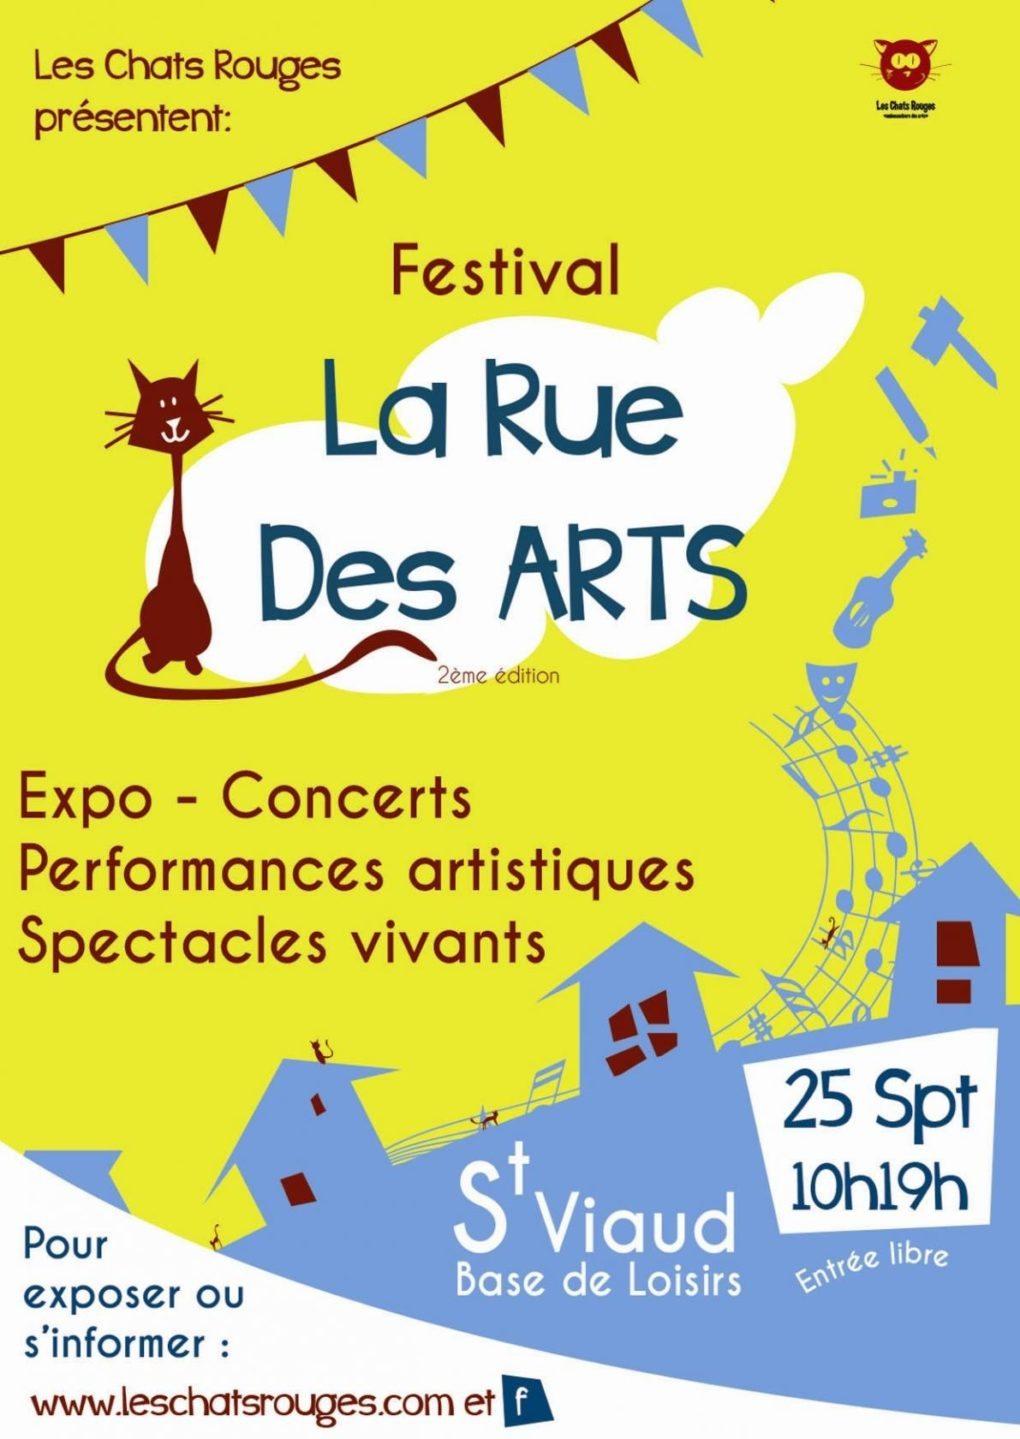 La Rue des Arts Saint-Viaud